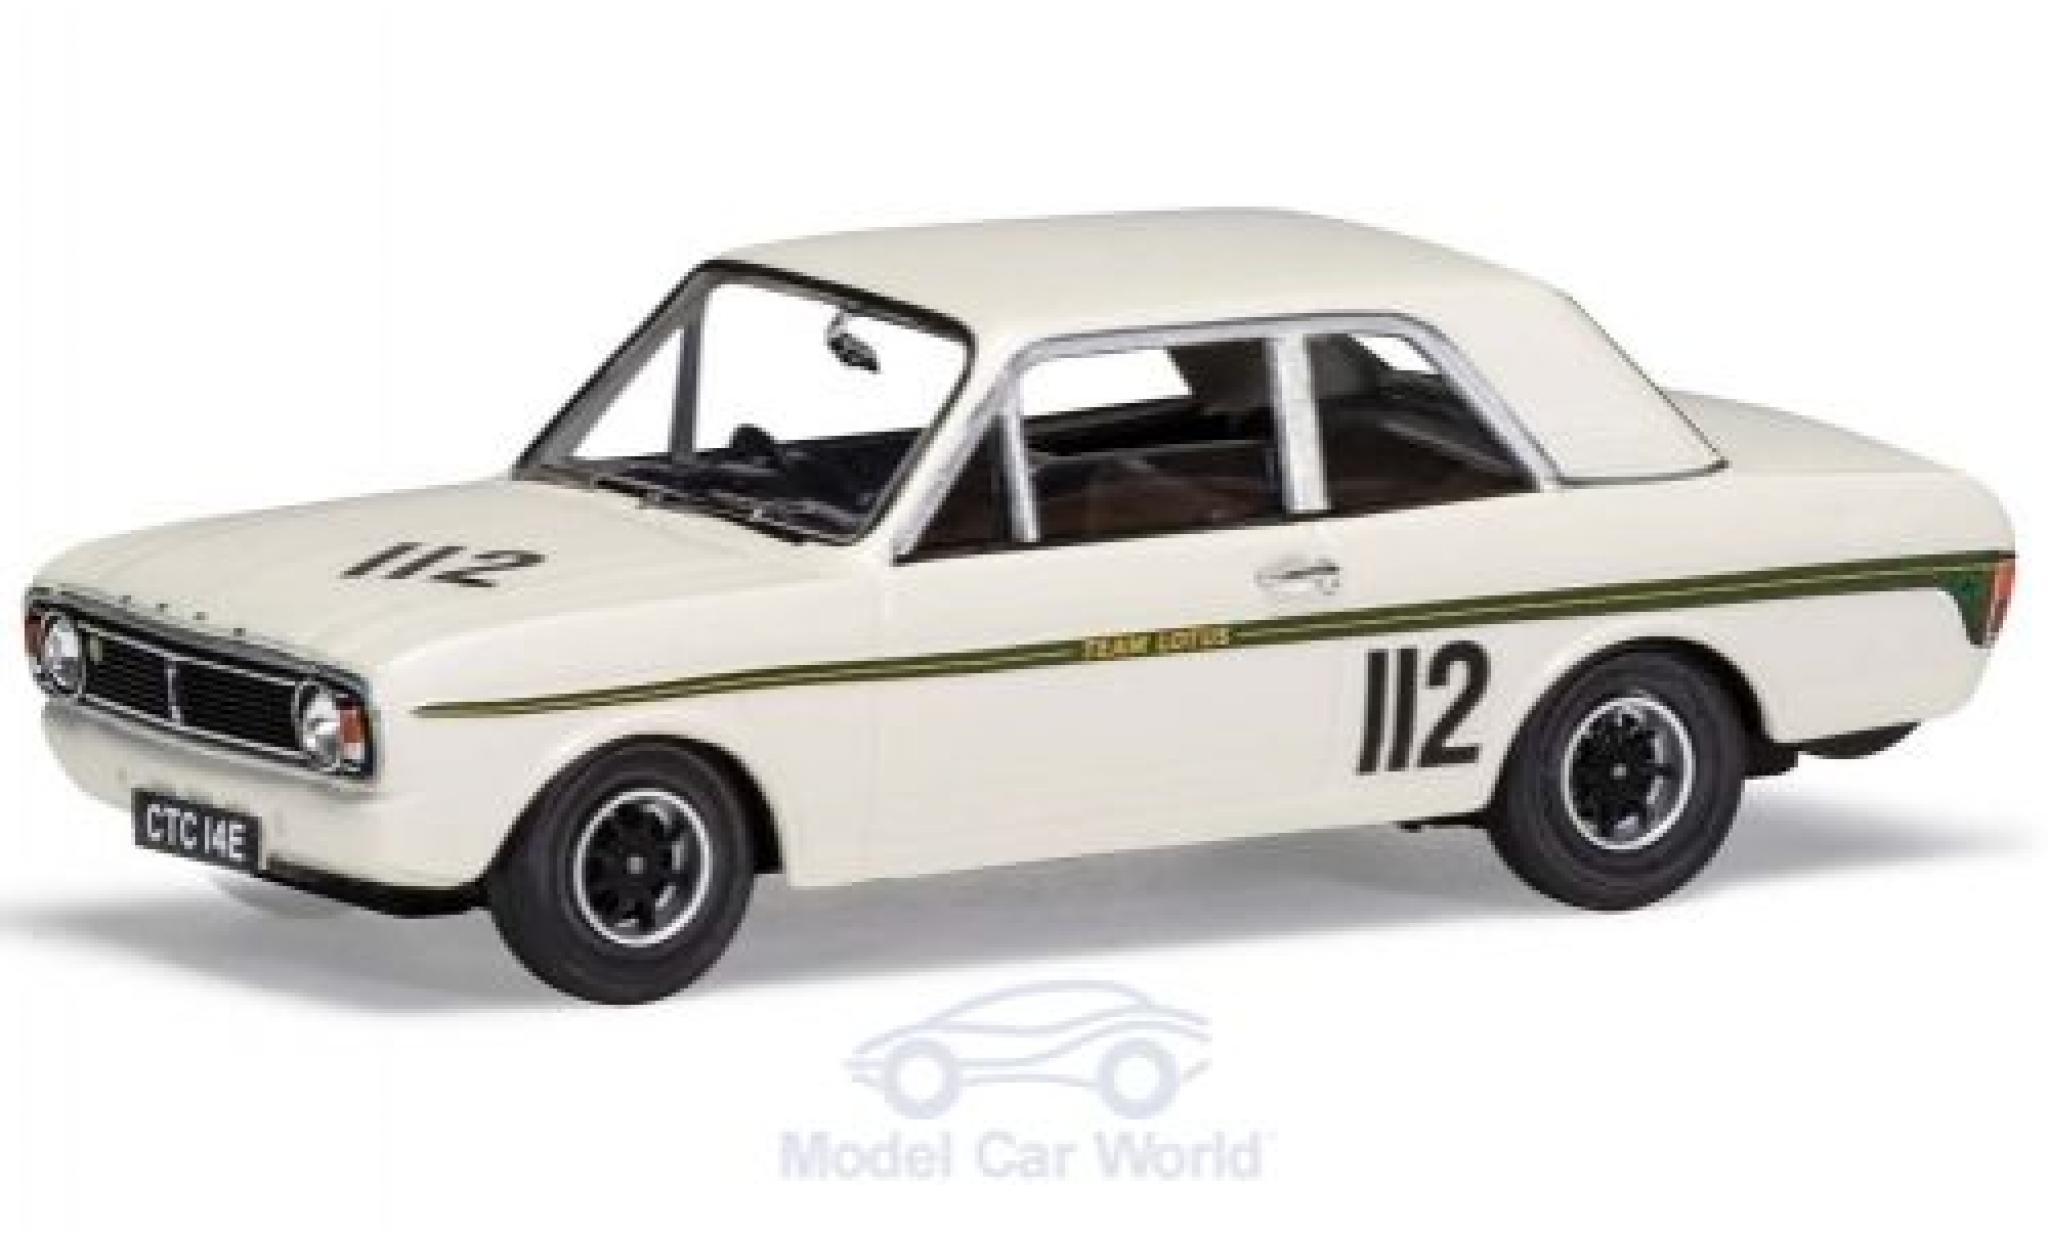 Ford Lotus 1/43 Vanguards Cortina Mk2 FVA RHD British Saloon Car Championship 1967 G.Hill